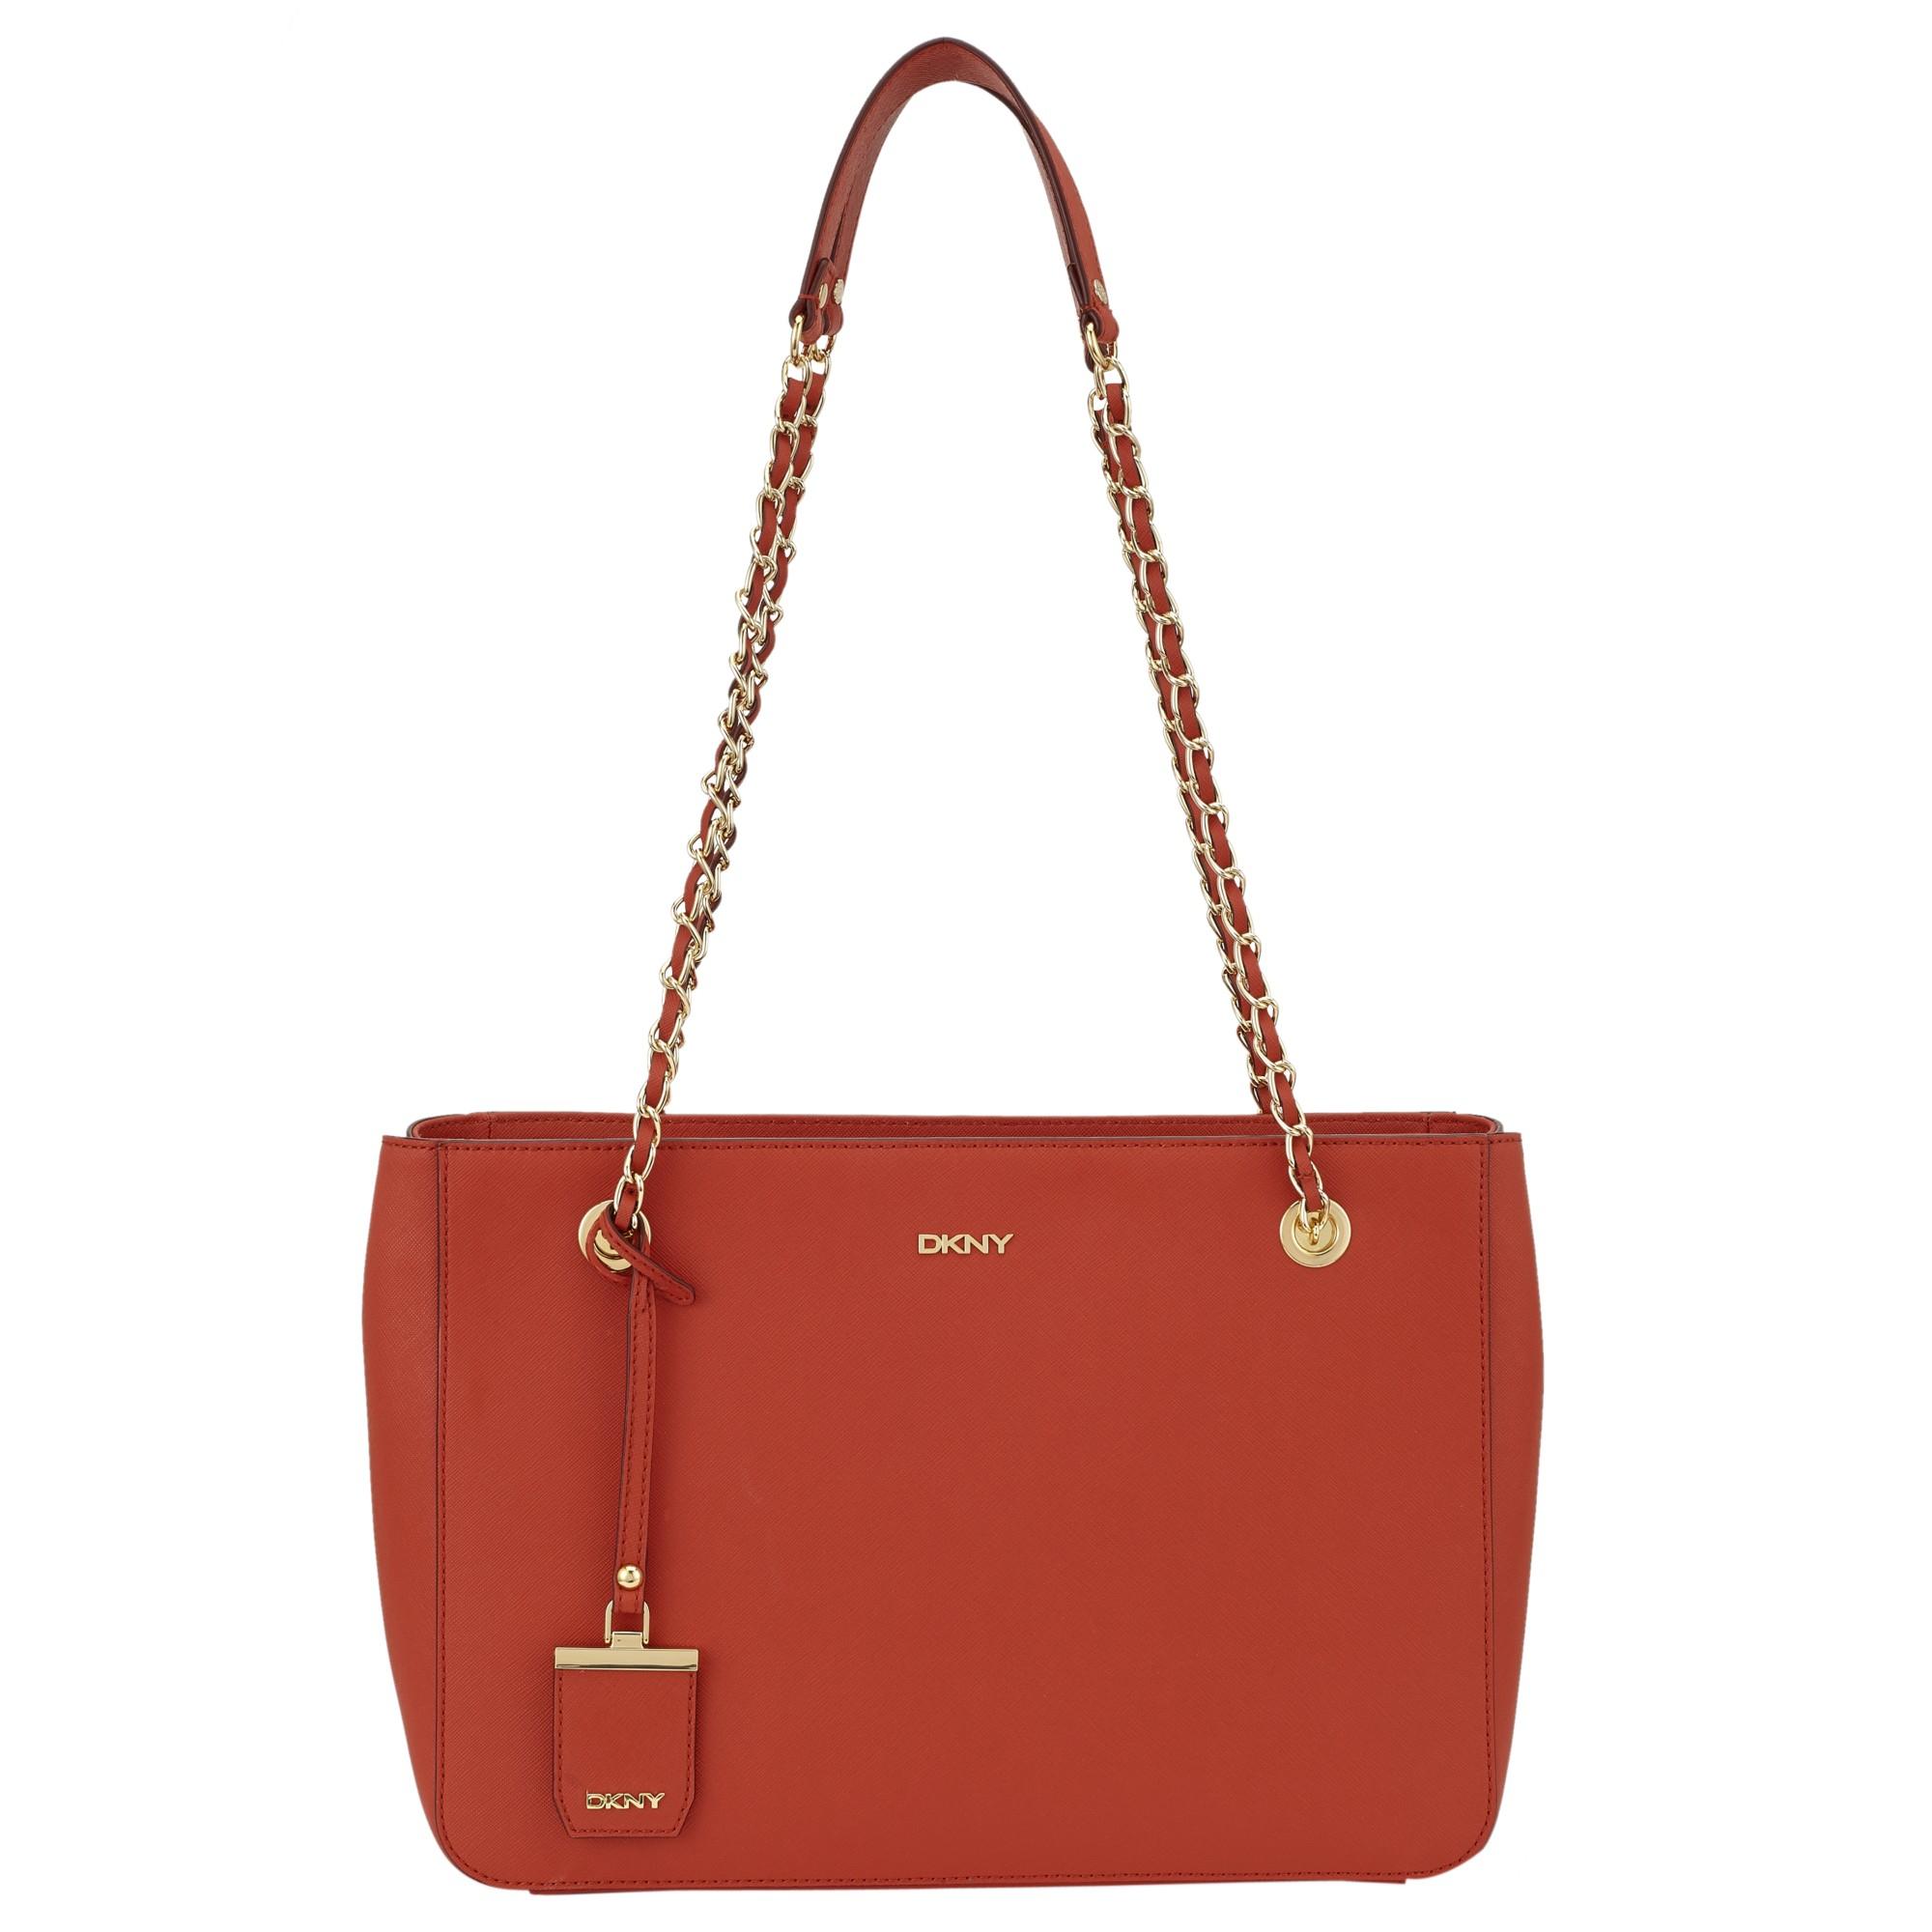 DKNY Bryant Park Saffiano Leather Chain Shopper Bag in Orange - Lyst 430552e2fb